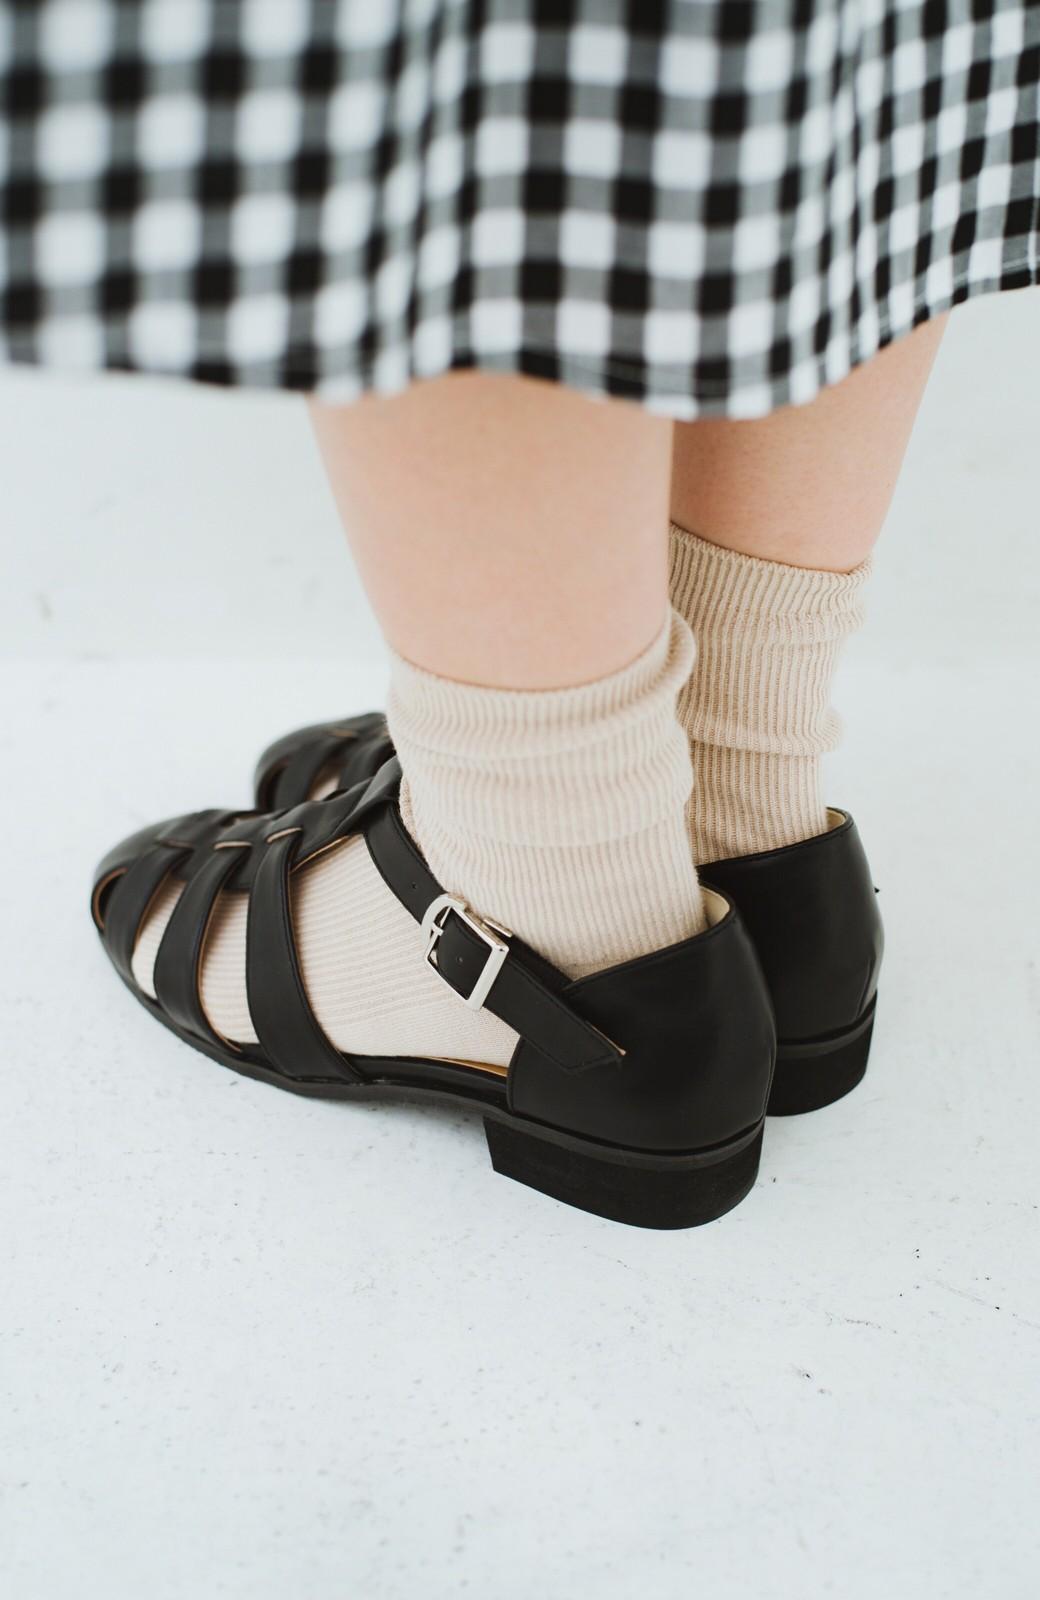 haco! 靴下でも素足でも合う 本革風編み込みサンダル <ブラック>の商品写真11